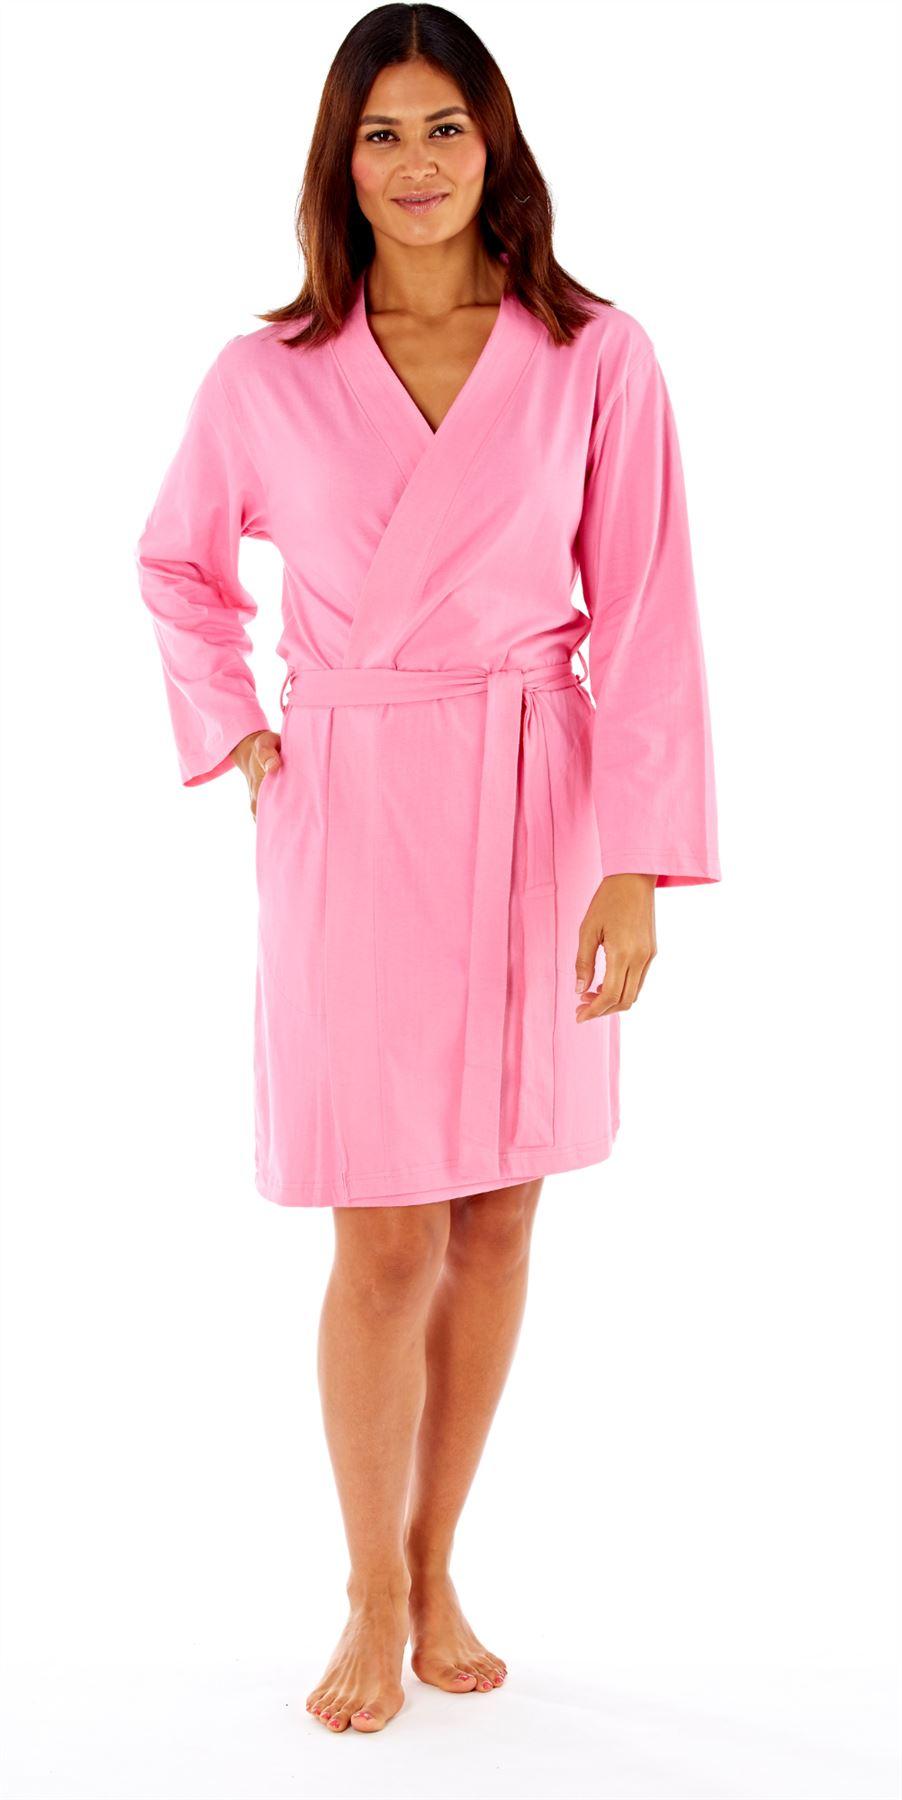 Ladies Womens Robe Soft Jersey Kimono Style Dressing Gown Cotton ...